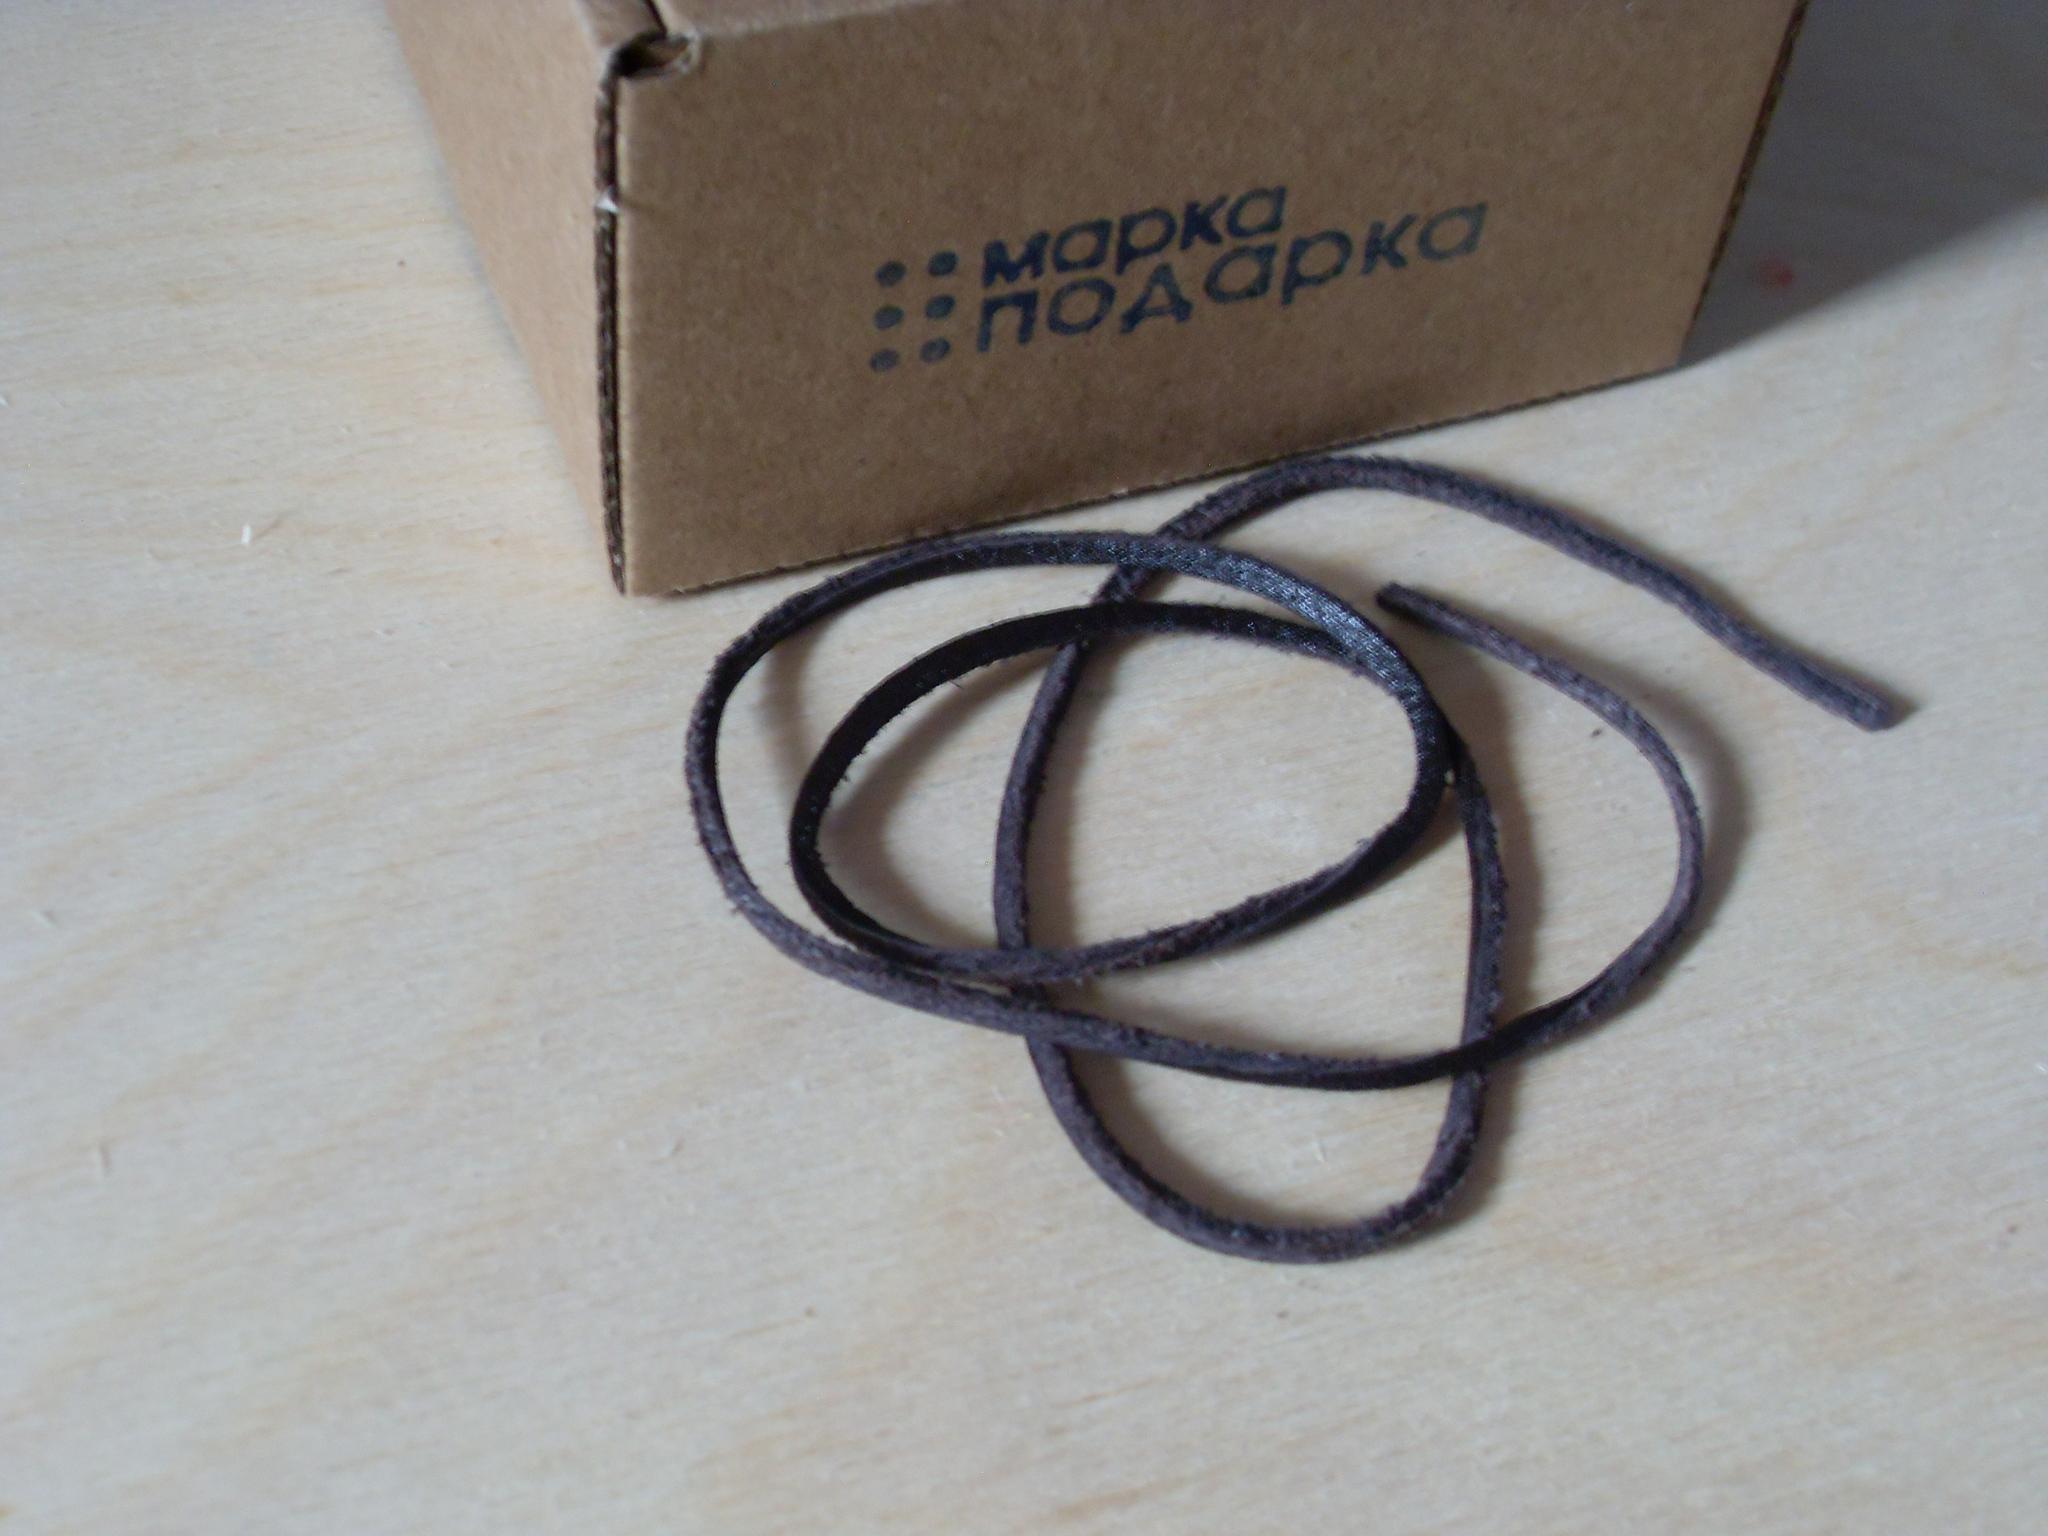 Фото шнурок кожаный 2-3 мм для кулонов 65 см